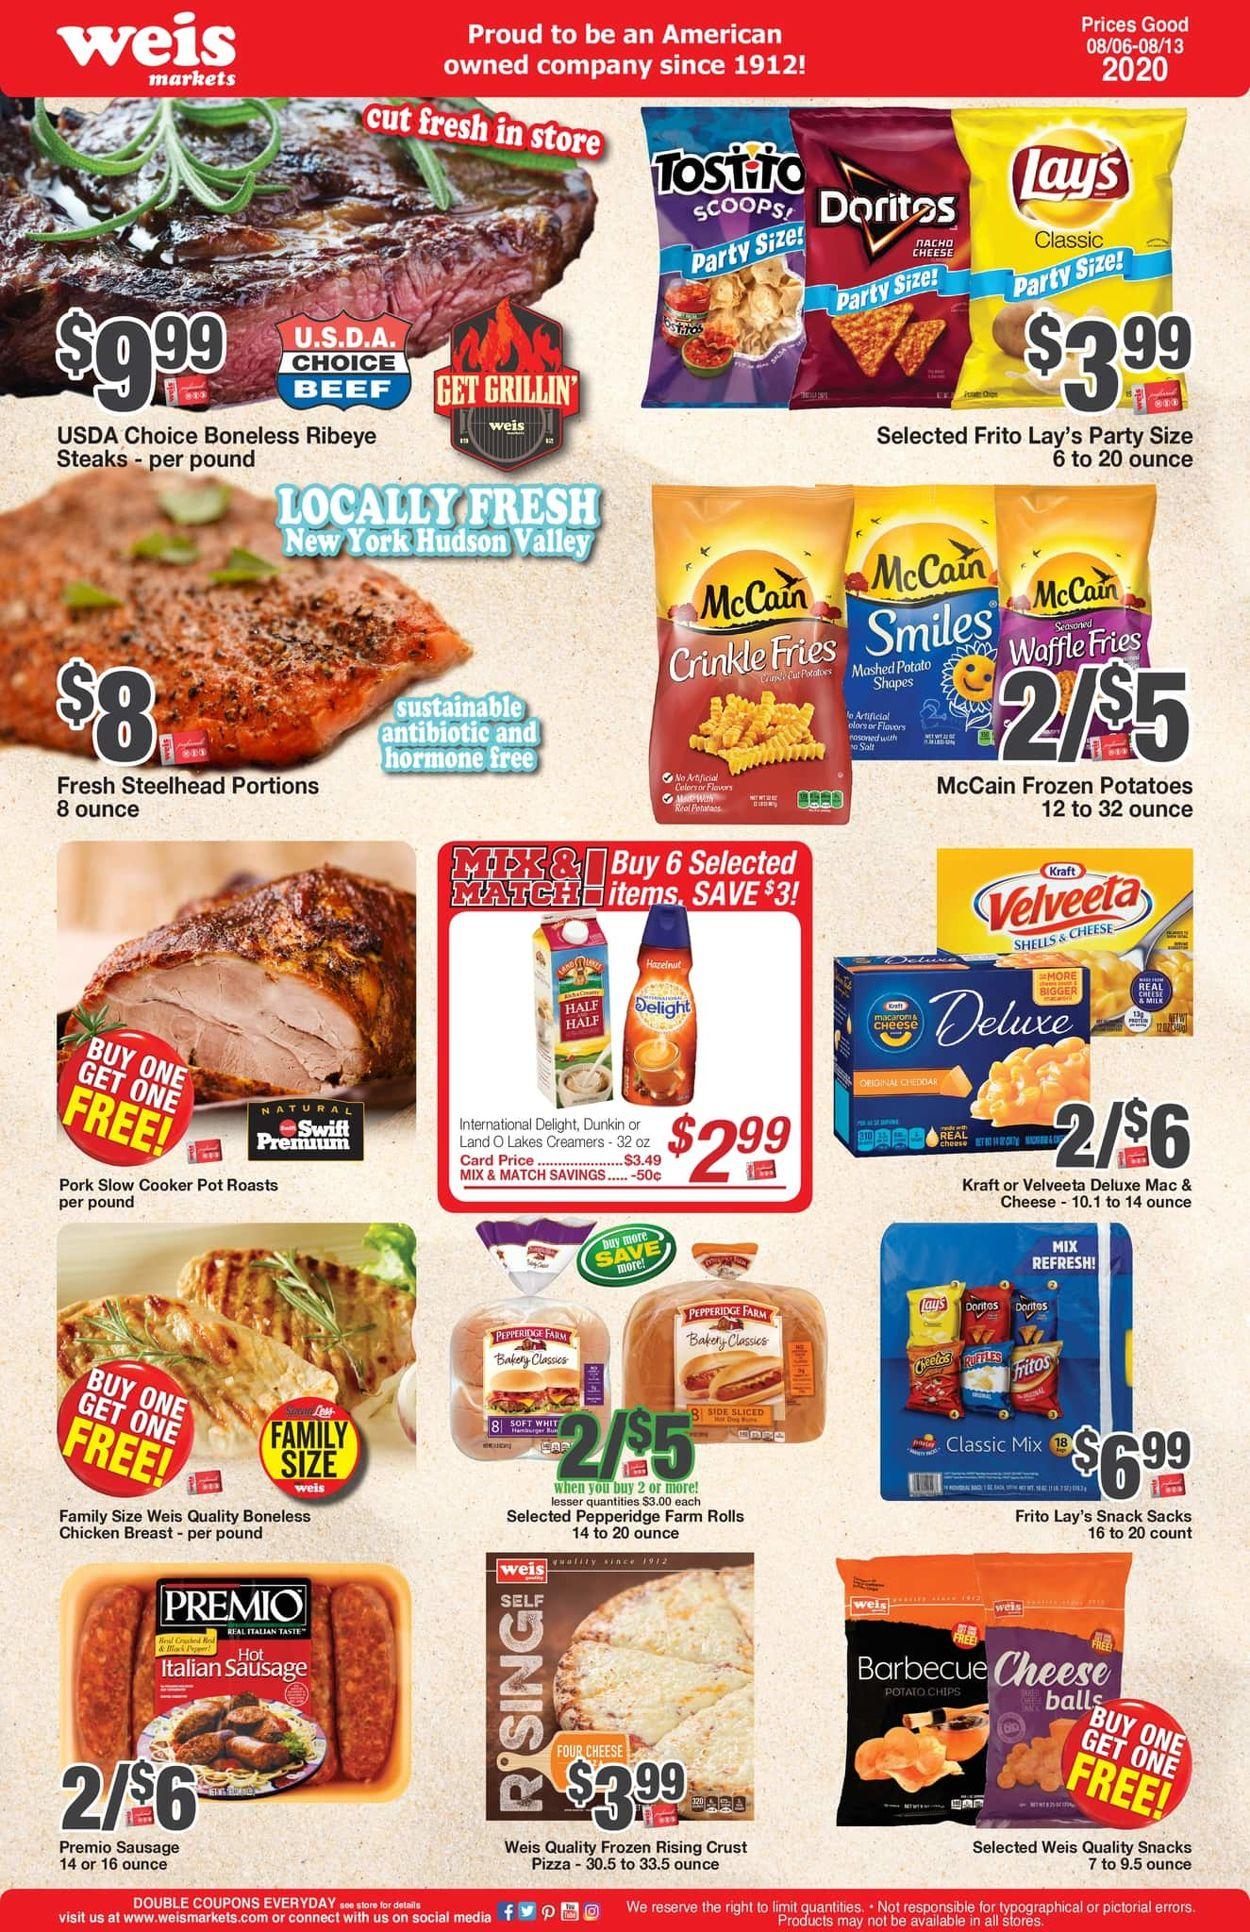 Weis Weekly Ad Circular - valid 08/06-08/13/2020